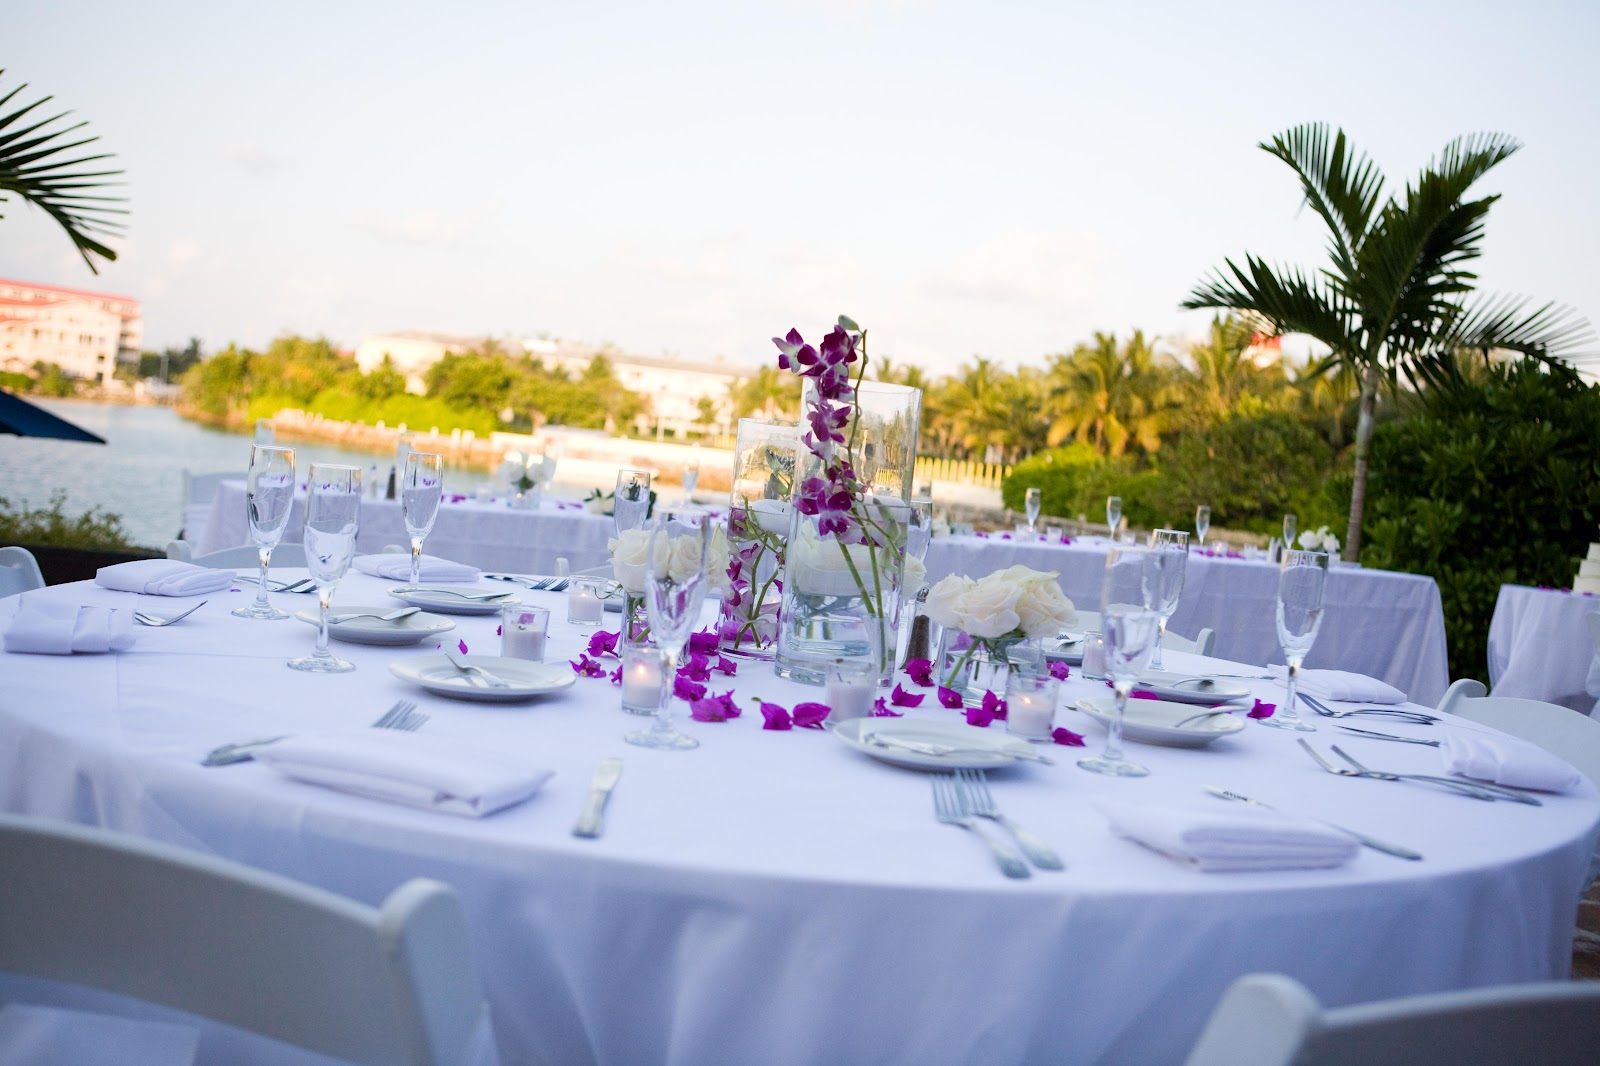 Chic Bahamas Weddings All Inclusive Grand Bahamas Destination Wedding At Pelican Bay